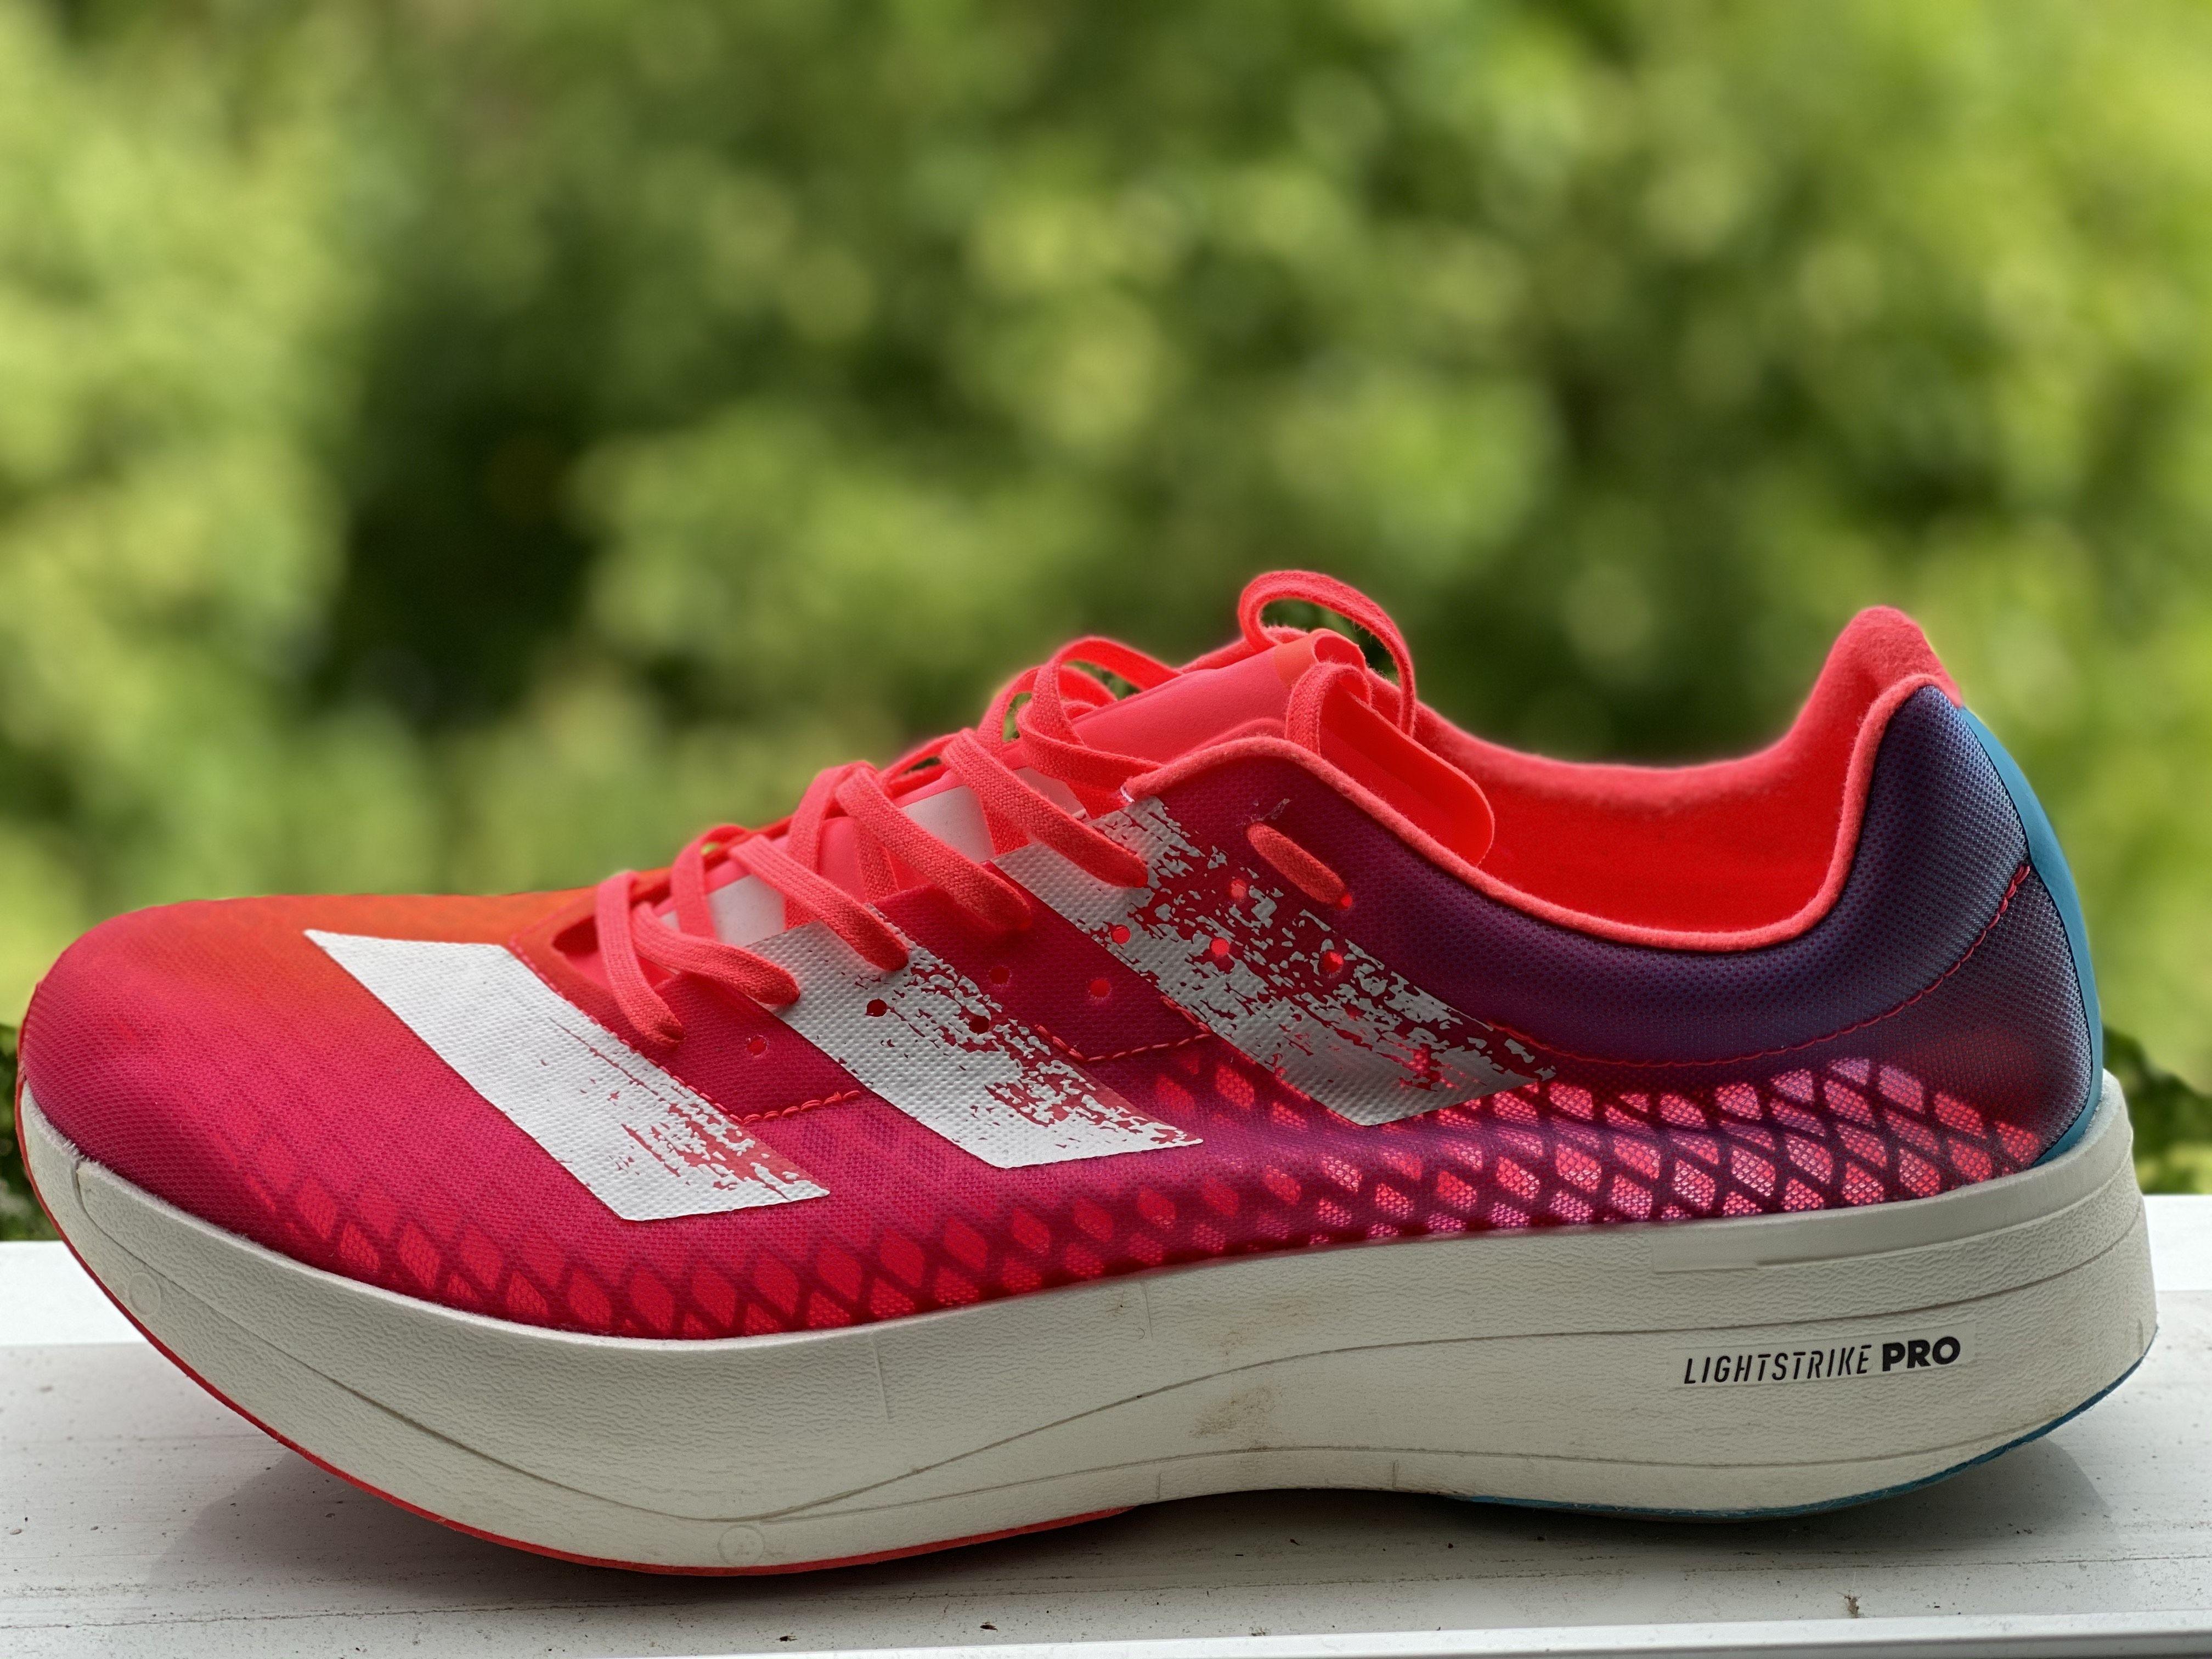 Shoe Review: Adidas Adizero Adios Pro marathon training and racing ...